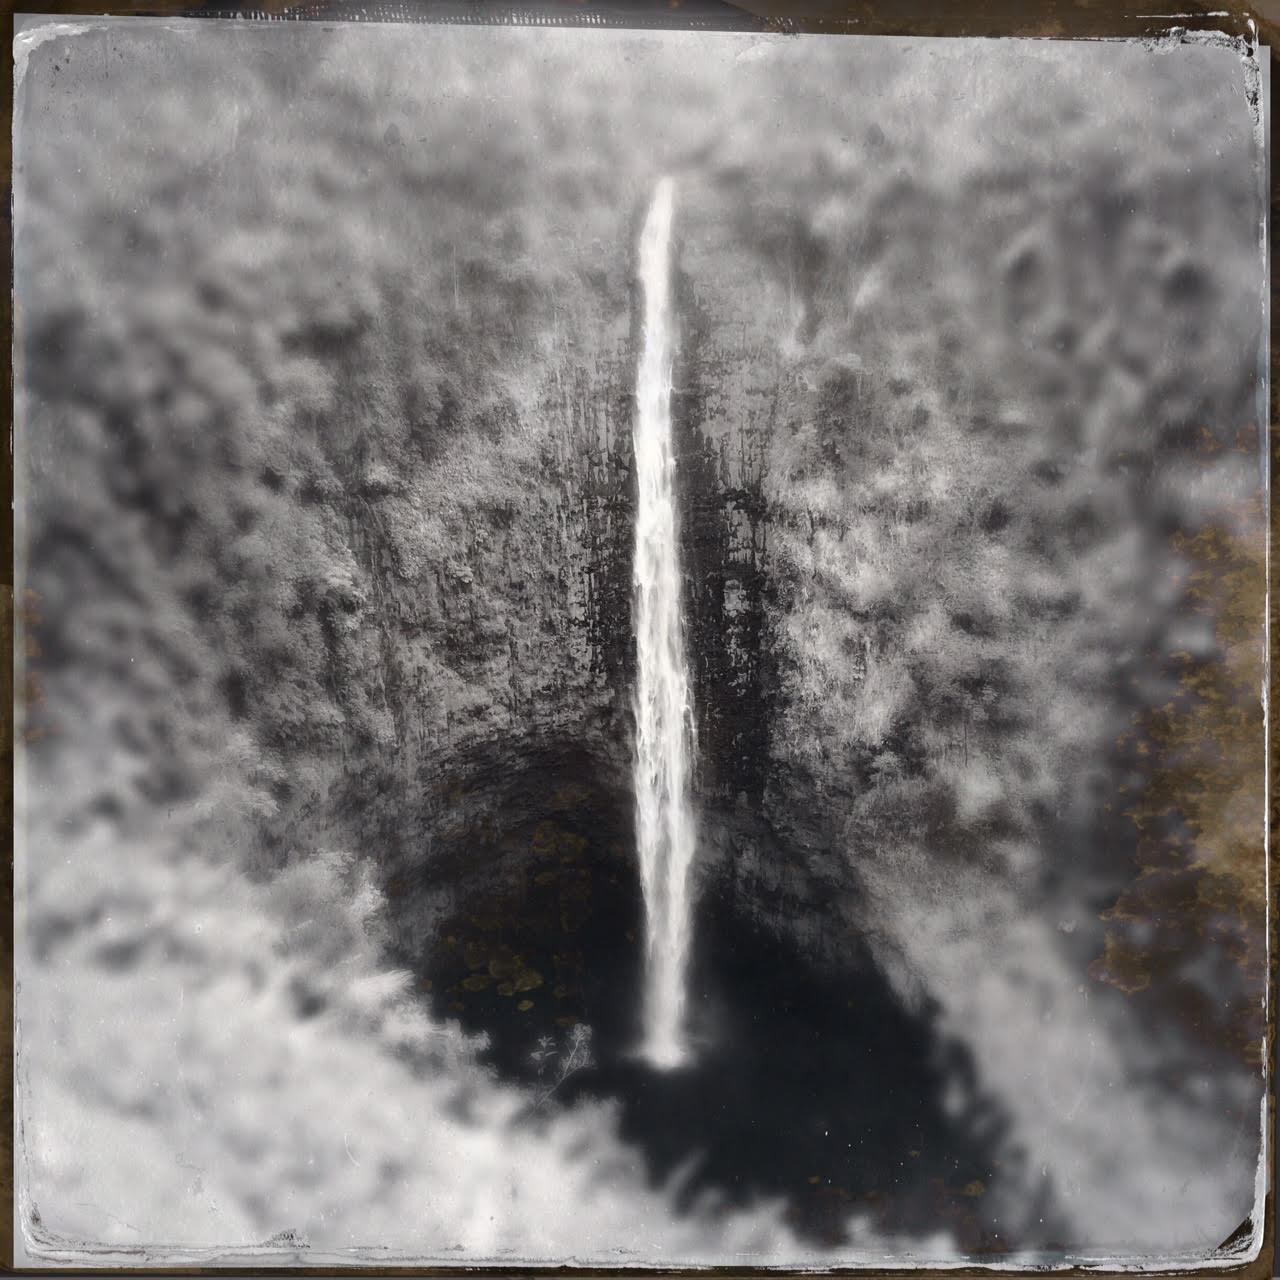 Silver Water Braid   I overheard wisdom of the ancients here   Akaka Falls, Hawaii   February 2015